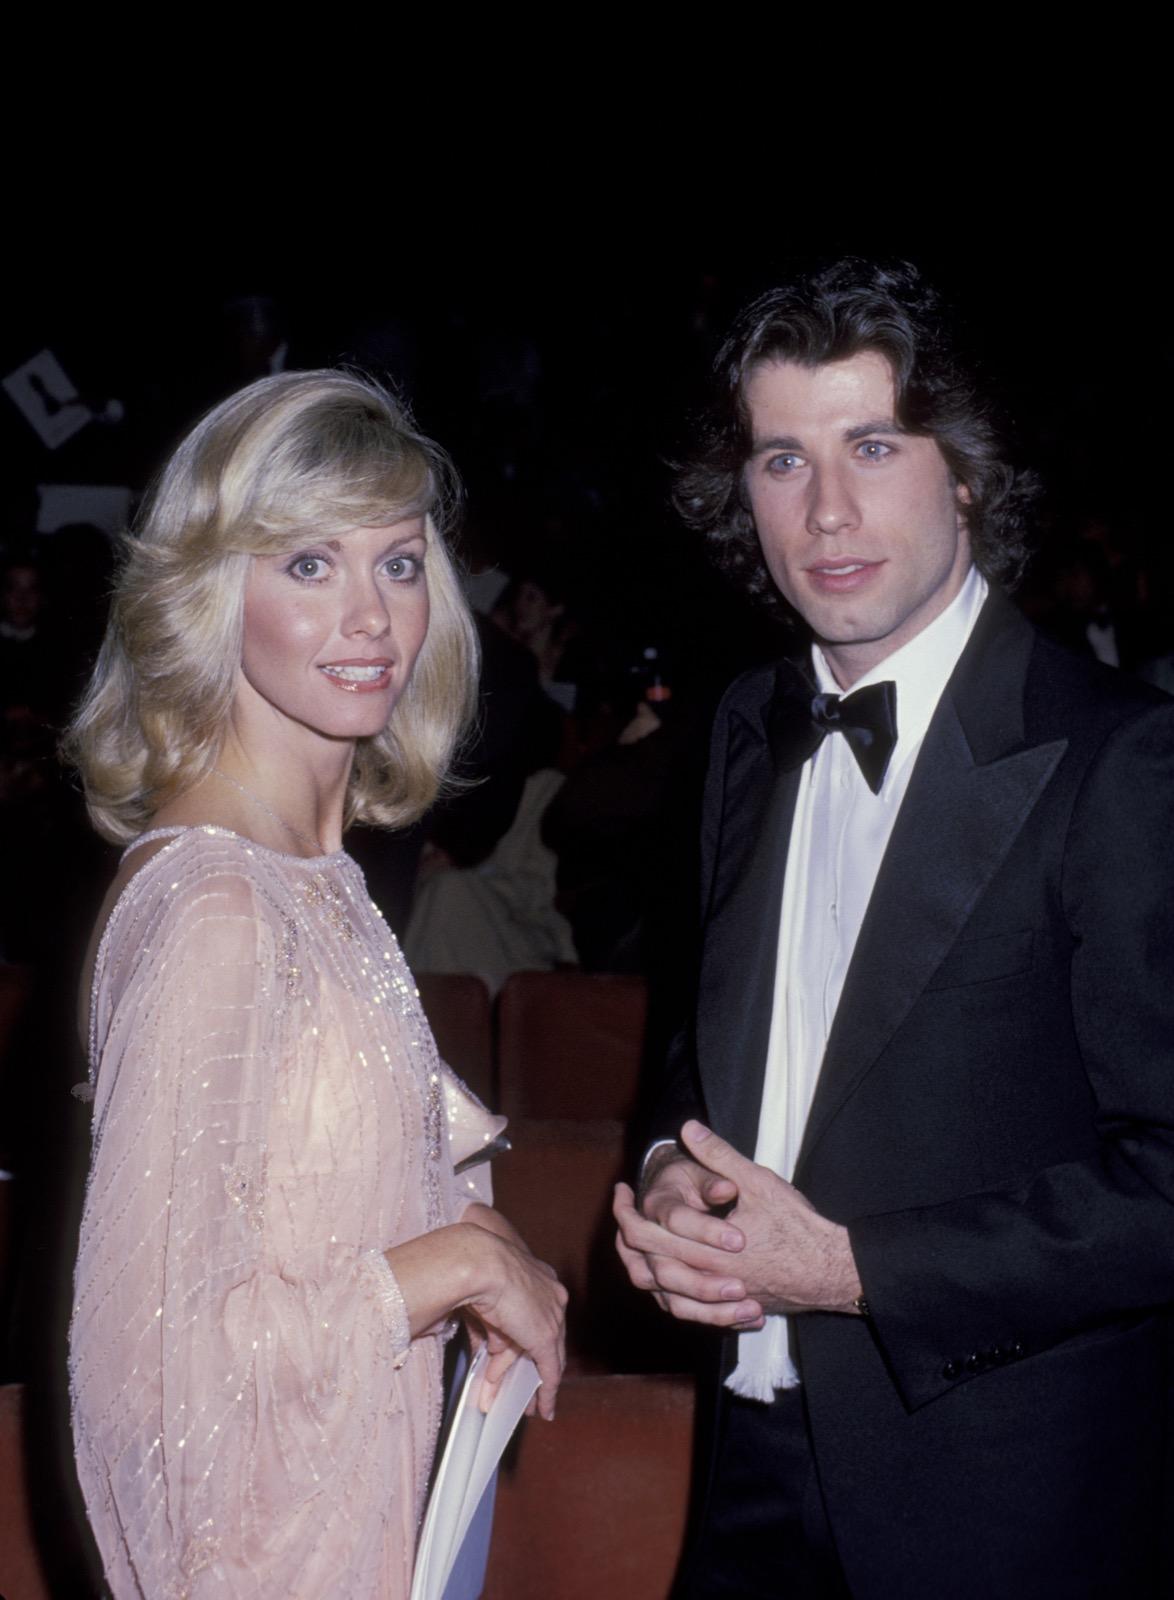 Classic Oscar images